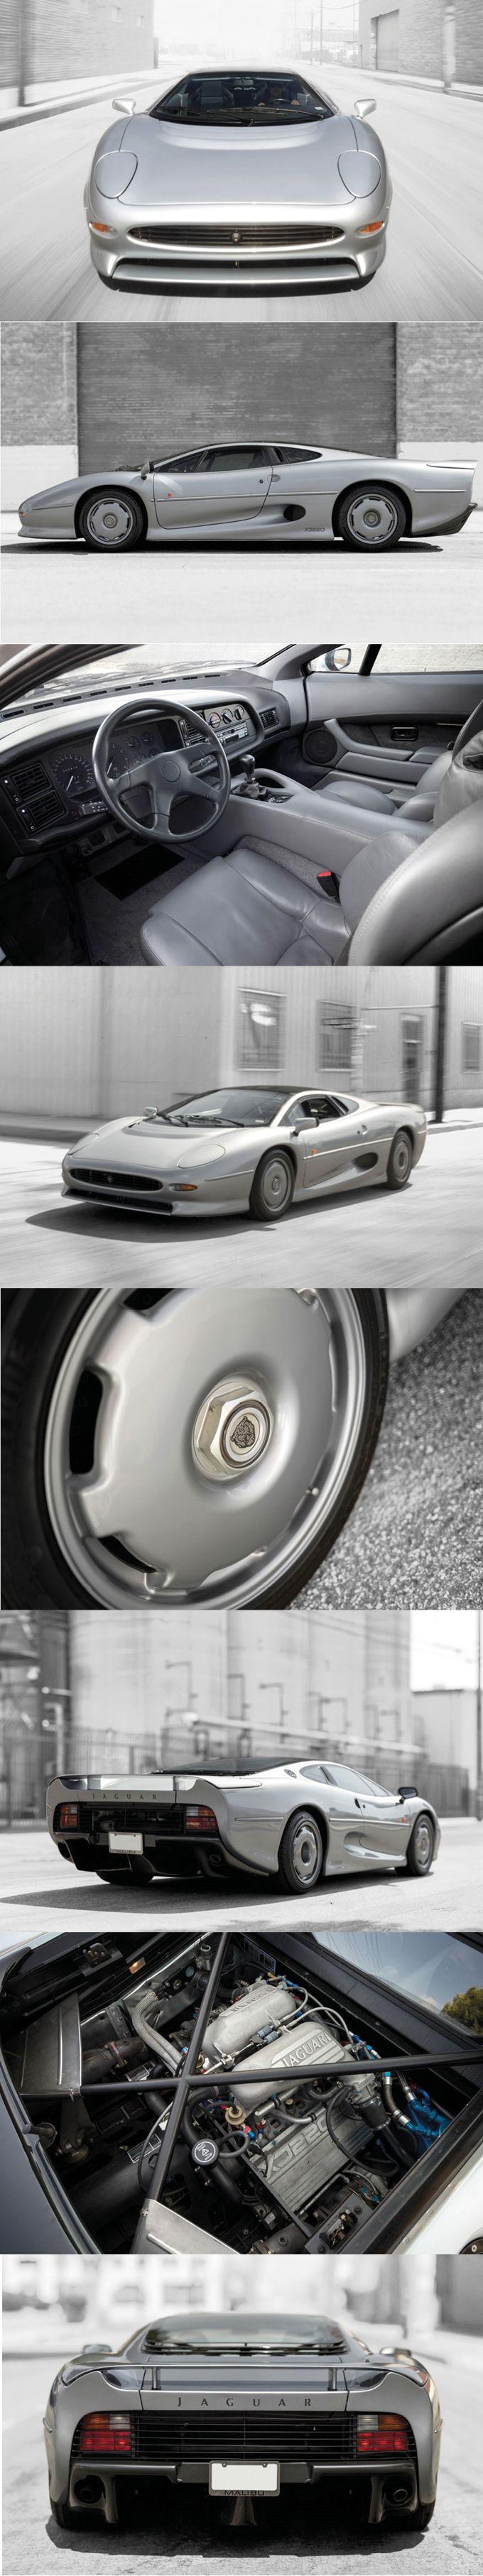 1993 Jaguar XJ220 / 542hp / 281 produced / $462.000 Sotheby's / UK / silver